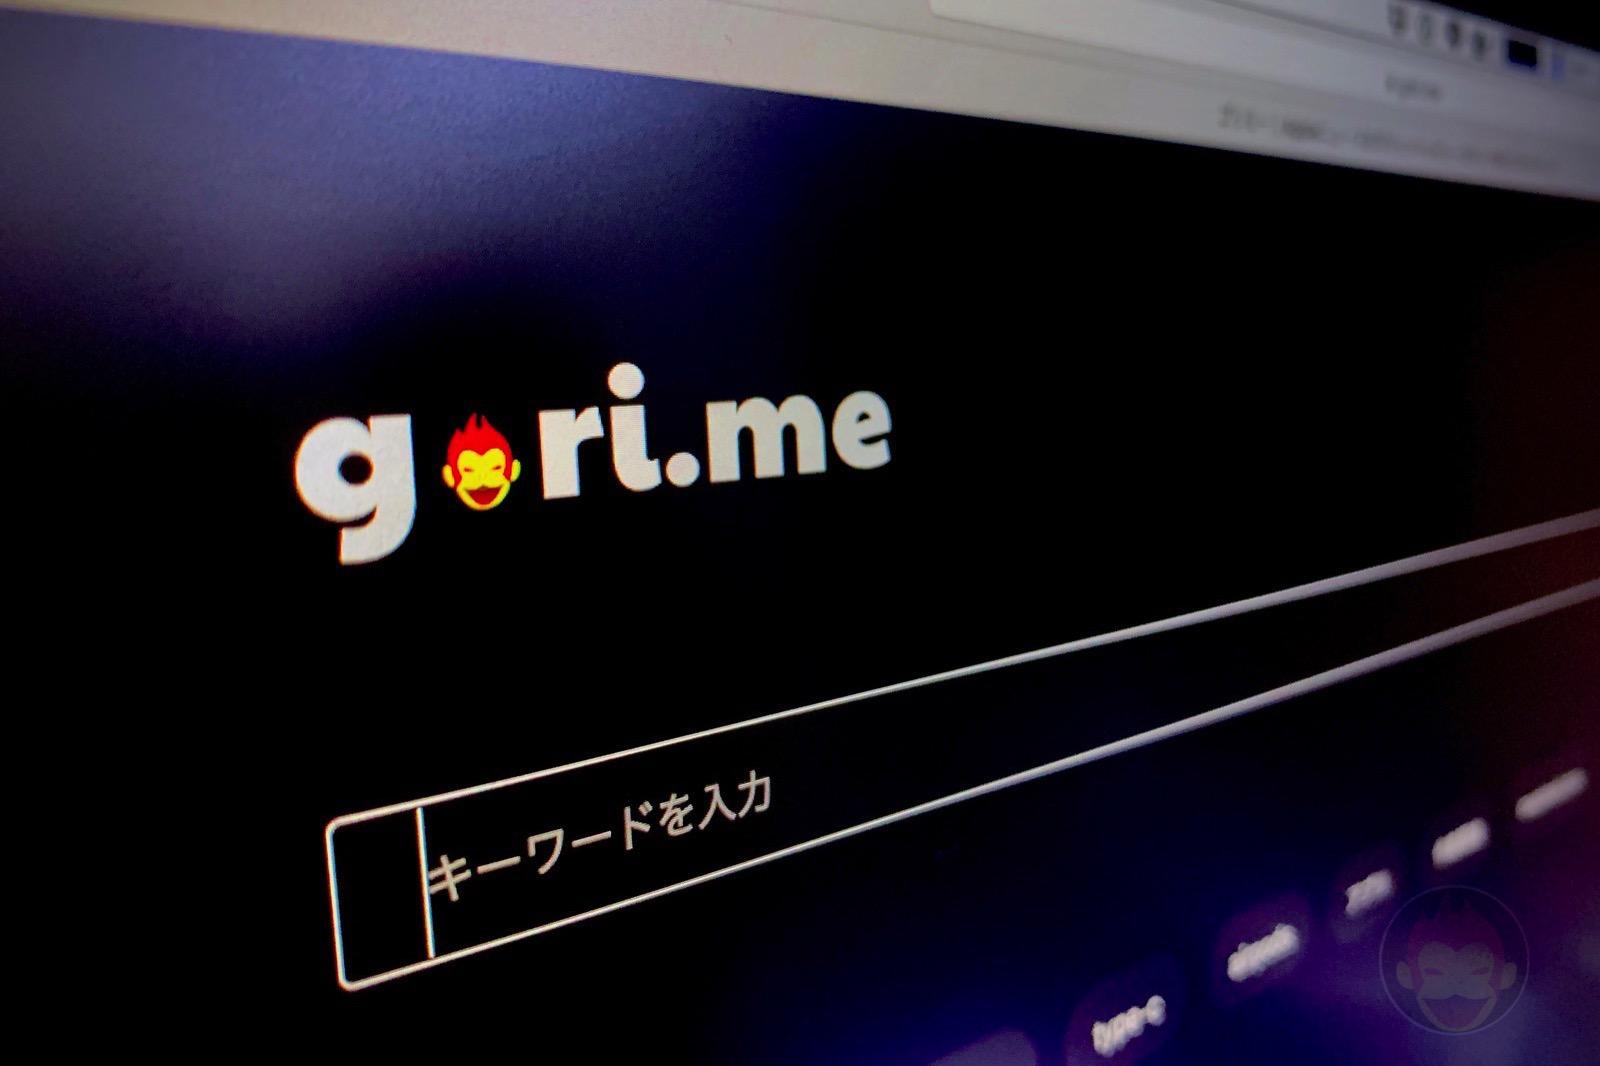 GoriMe-Search-Box-01.jpg